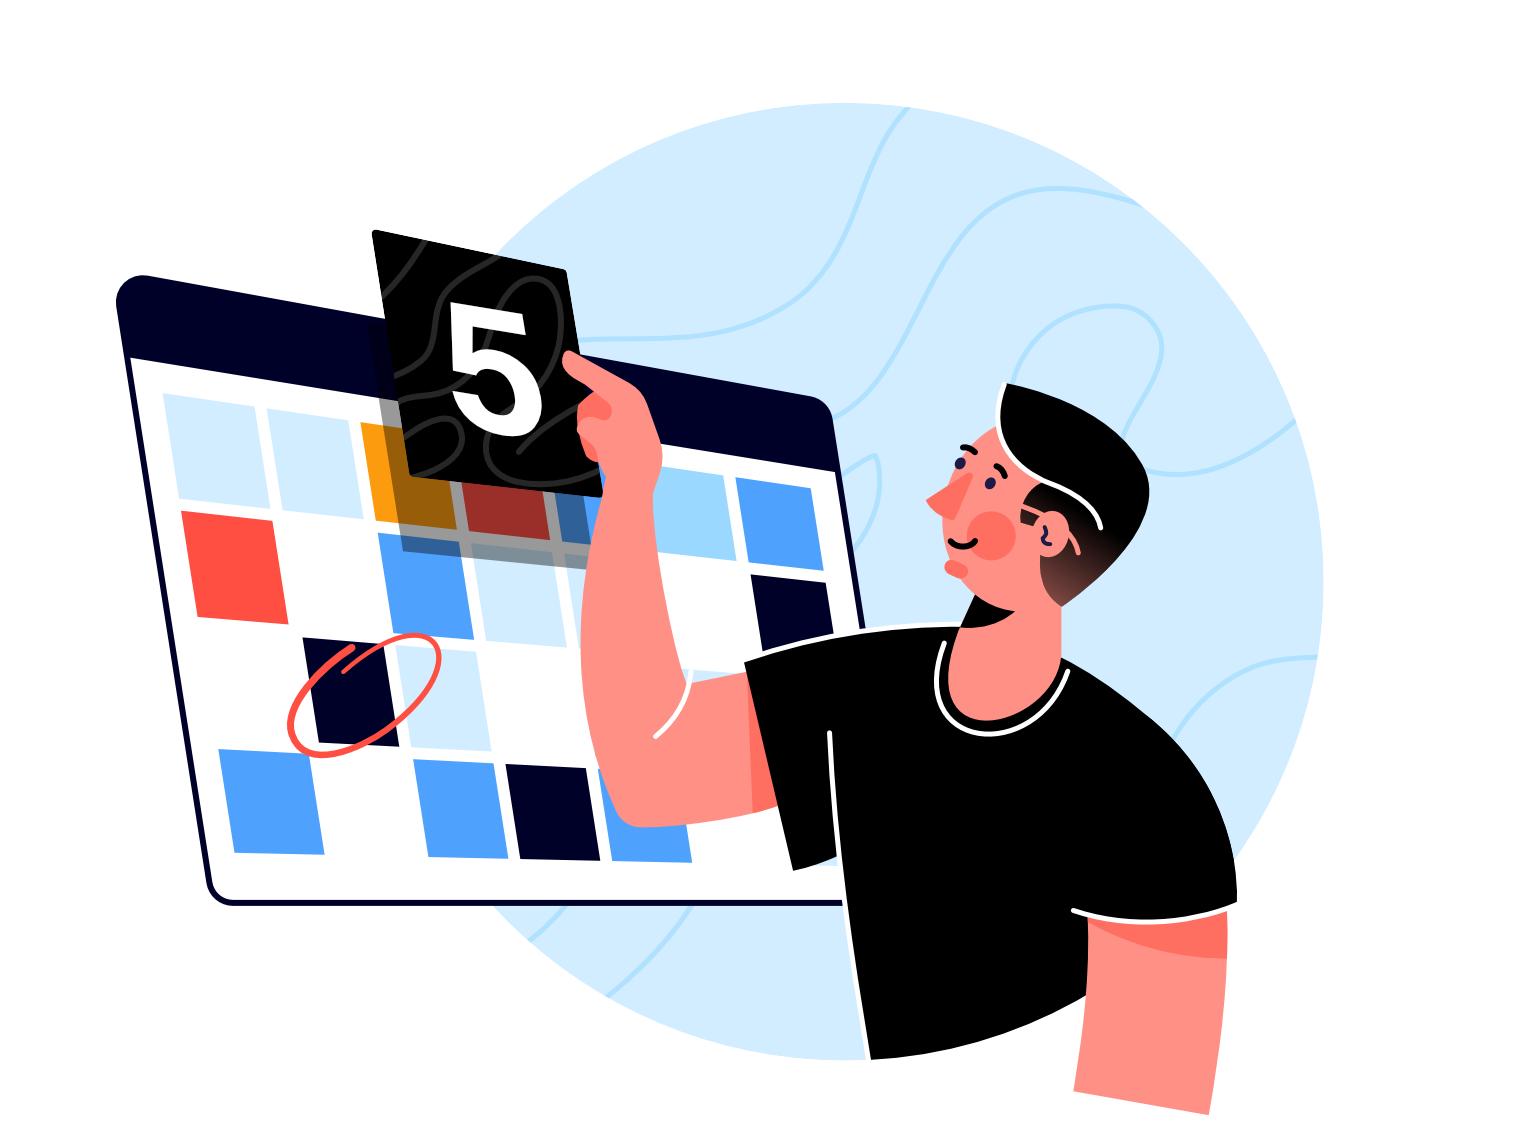 Calendar webpage affinity designer man clean simple character illustration vector